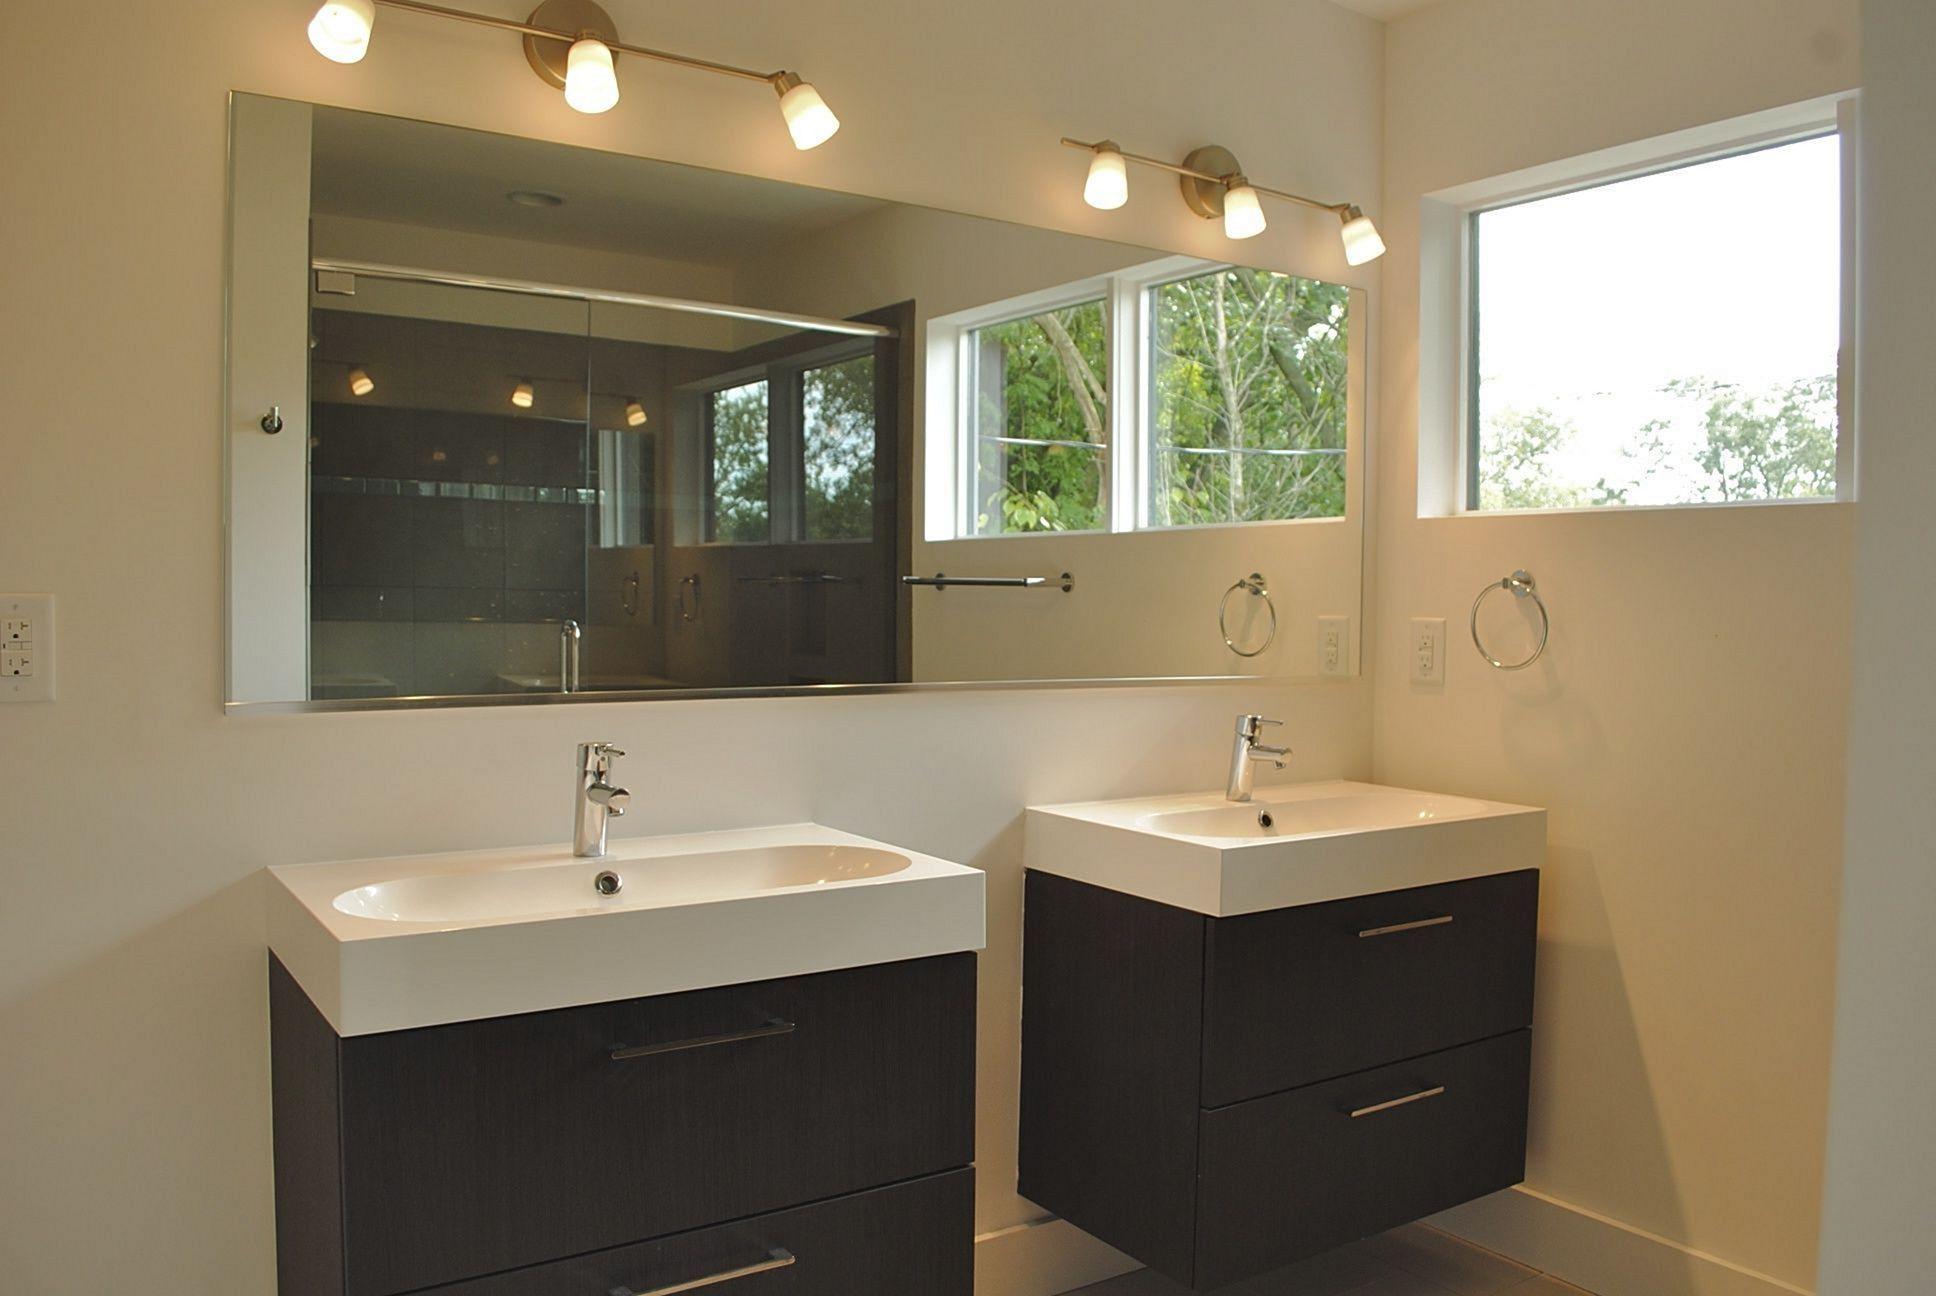 30 Awesome Bathroom Island Design Ideas For Amazing Bathroom Freshouz Com Amazing Bathrooms Small Bathroom Vanities Bathroom Design